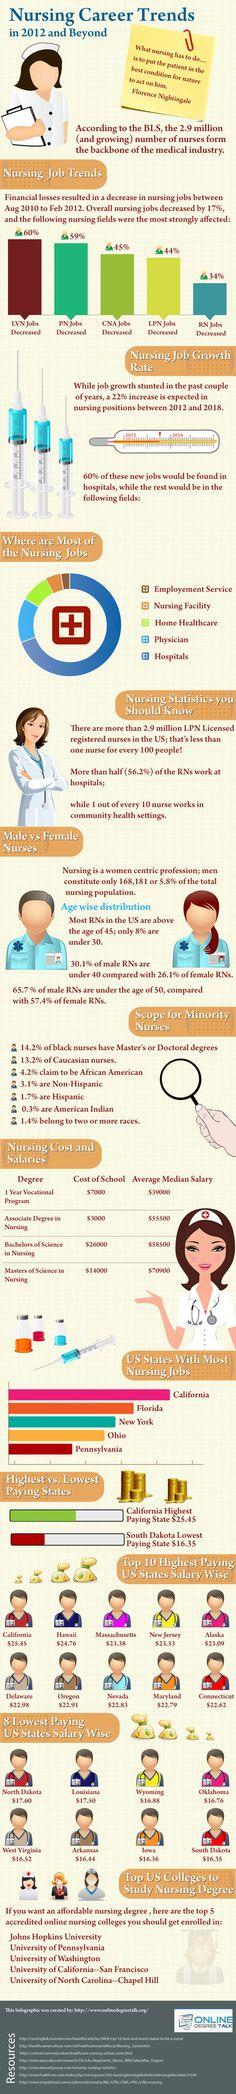 Why Good Nurses Leave the Profession